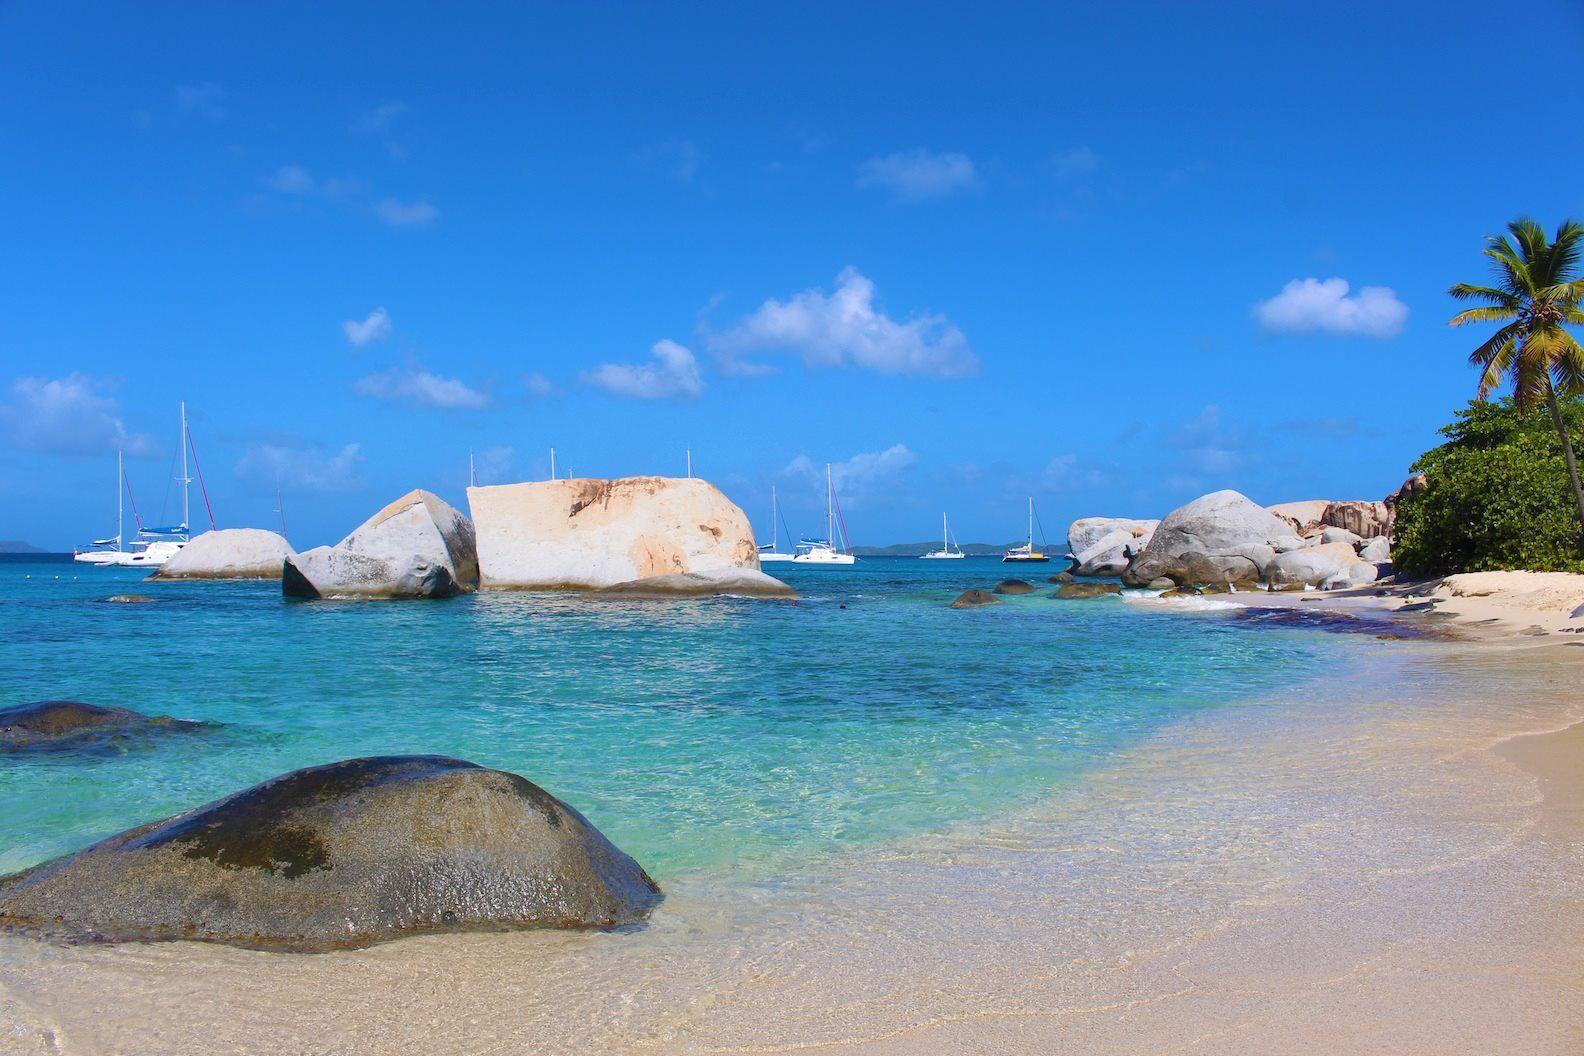 Virgin Gorda British Virgin Islands   Beaches in the world